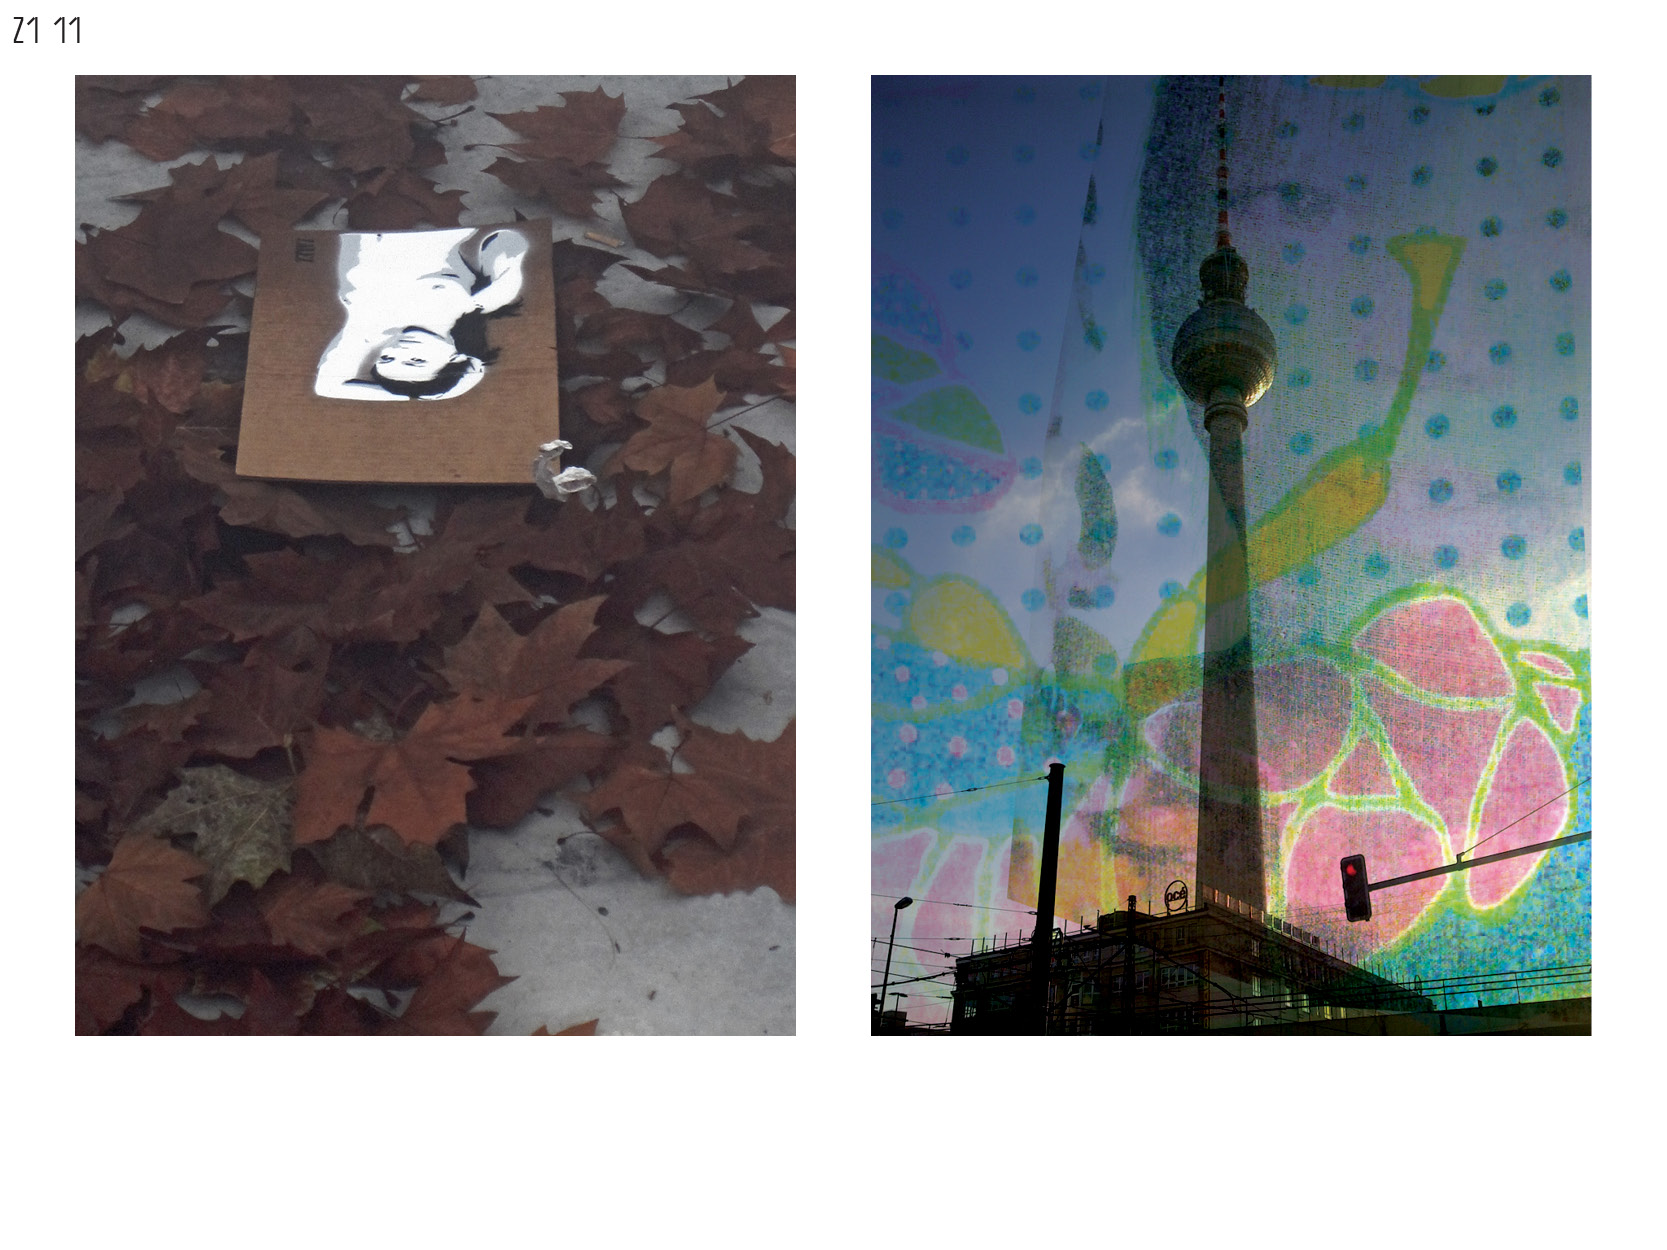 Gerrit-Schweiger-Dialog-Städte-Paris-Berlin-Jessica-Blank-Experiment-Fotoserie-Tagebuch-visuelle-Kommunikation-36